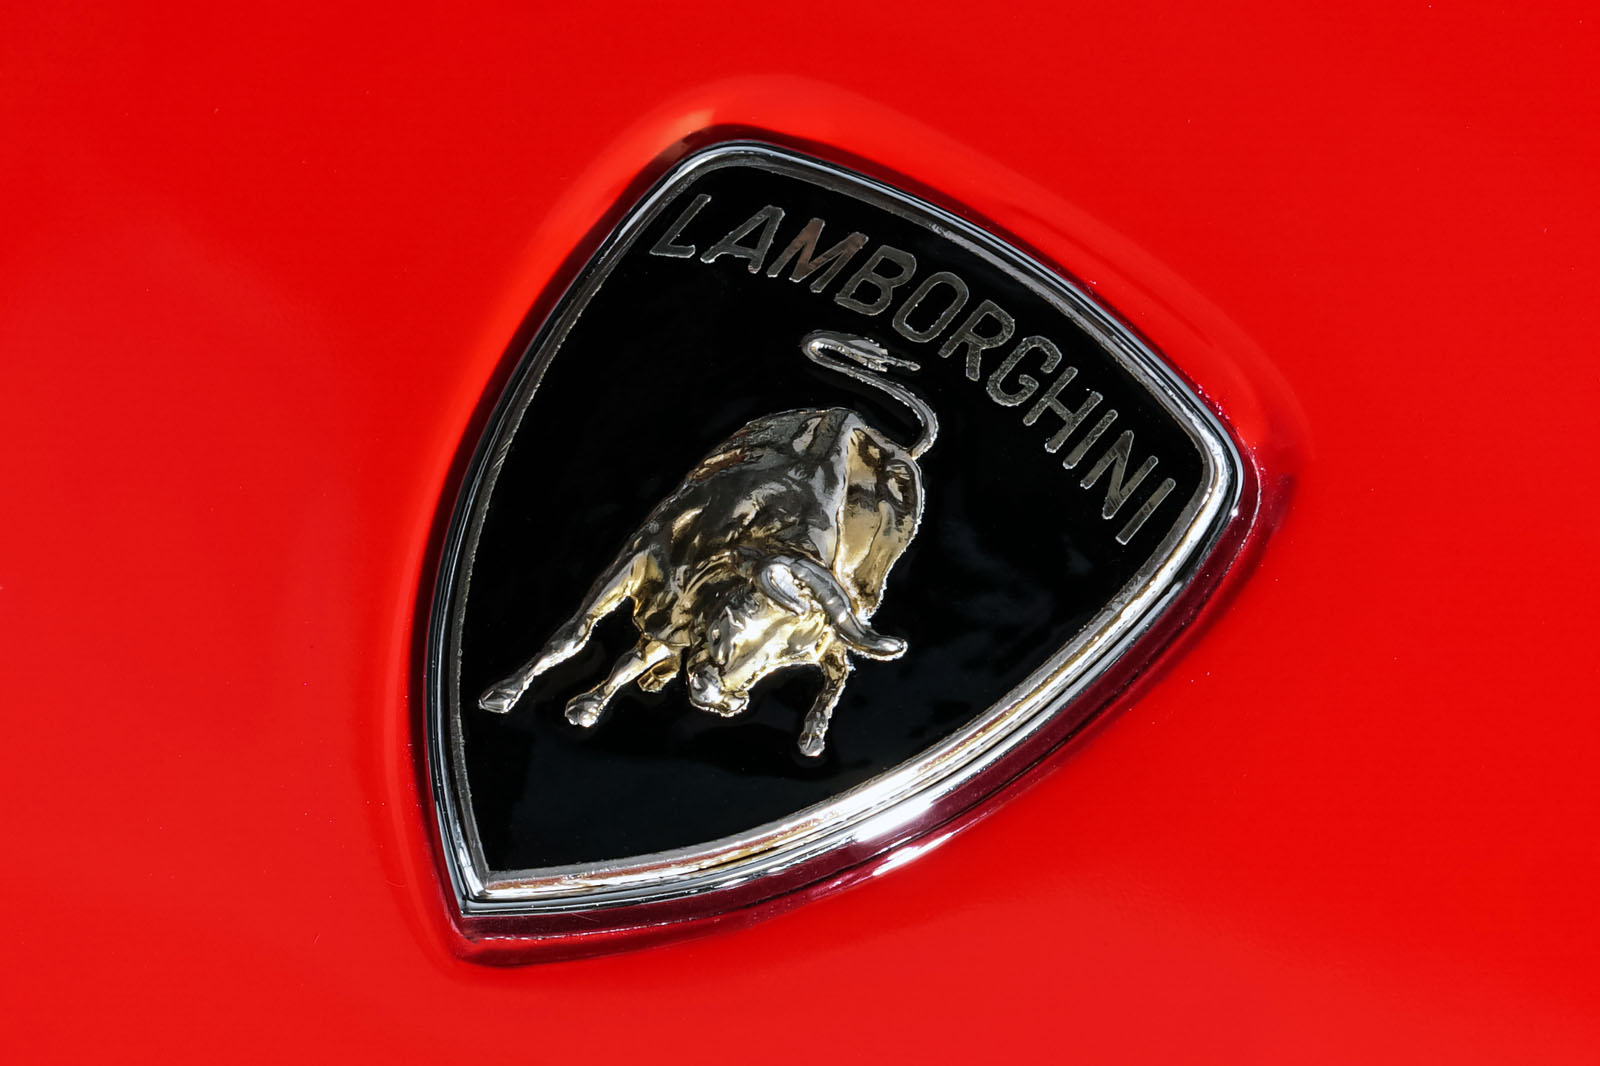 Lamborghini_Countach_Rot_Schwarz_LAM-2811_14_w